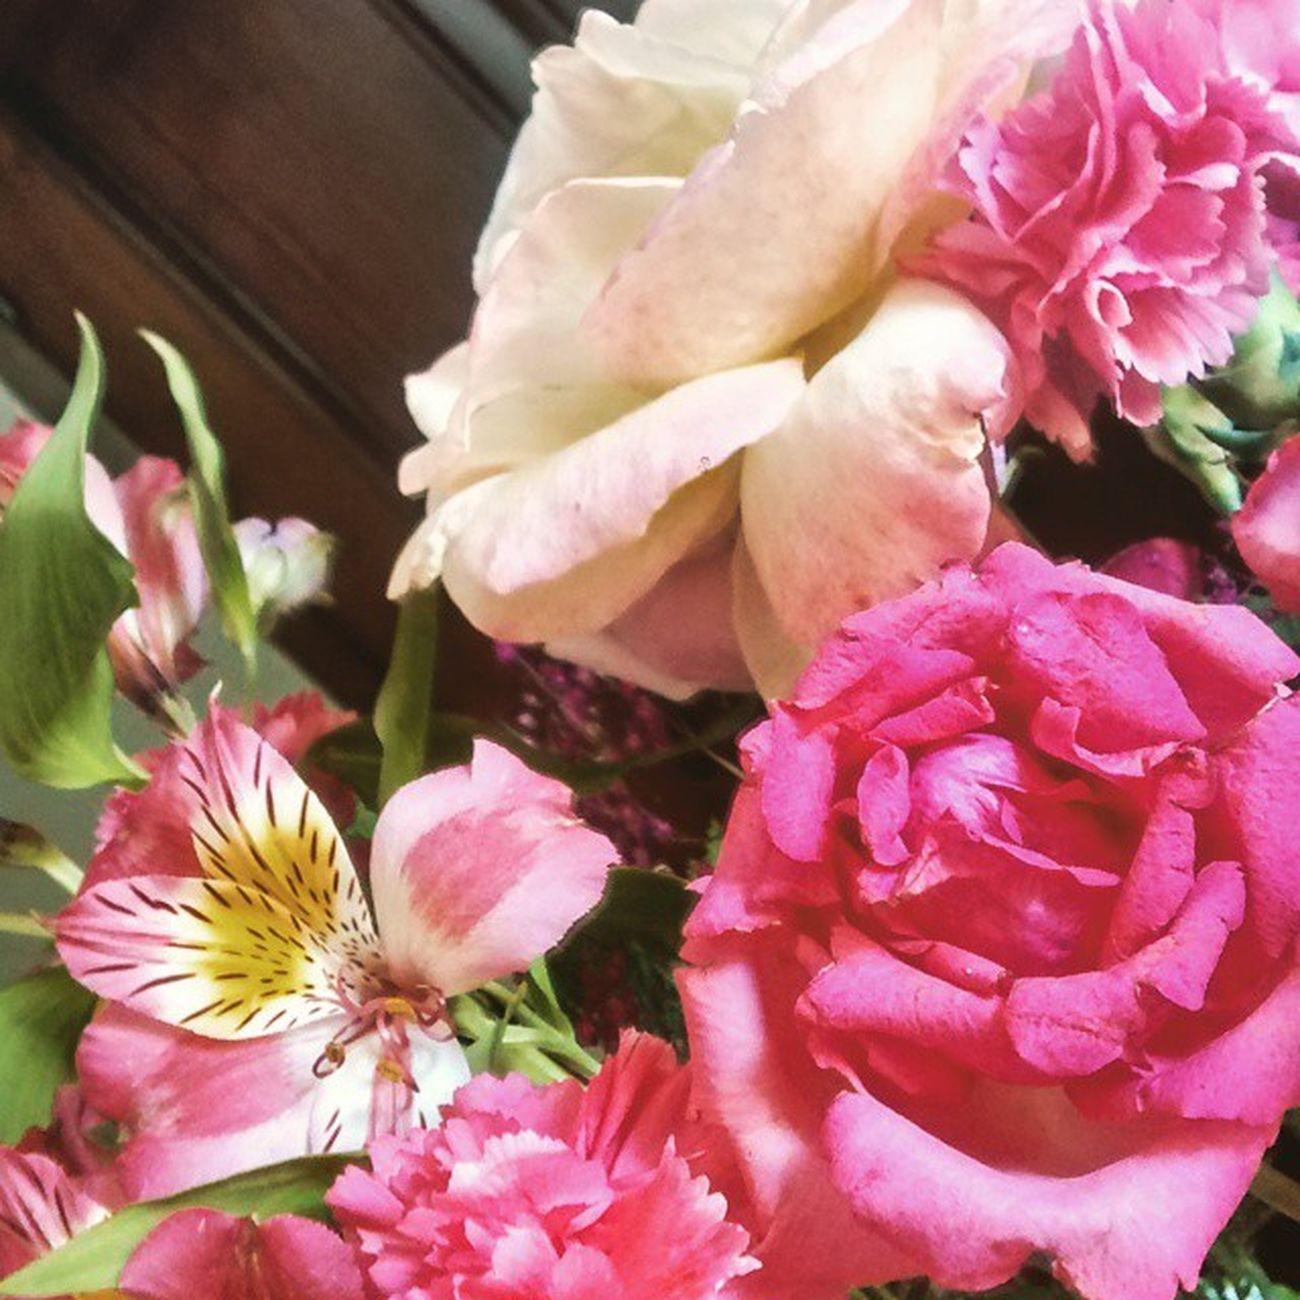 Rosas, alstro e cravos...cores lindas p uma tarde cinza. Arranjodeflores Arranjosflorais Decoracaodefestas Decoracaopersonalizada Decoracaodecasamento Decoracaorosaeamarela Rosaeamarelo